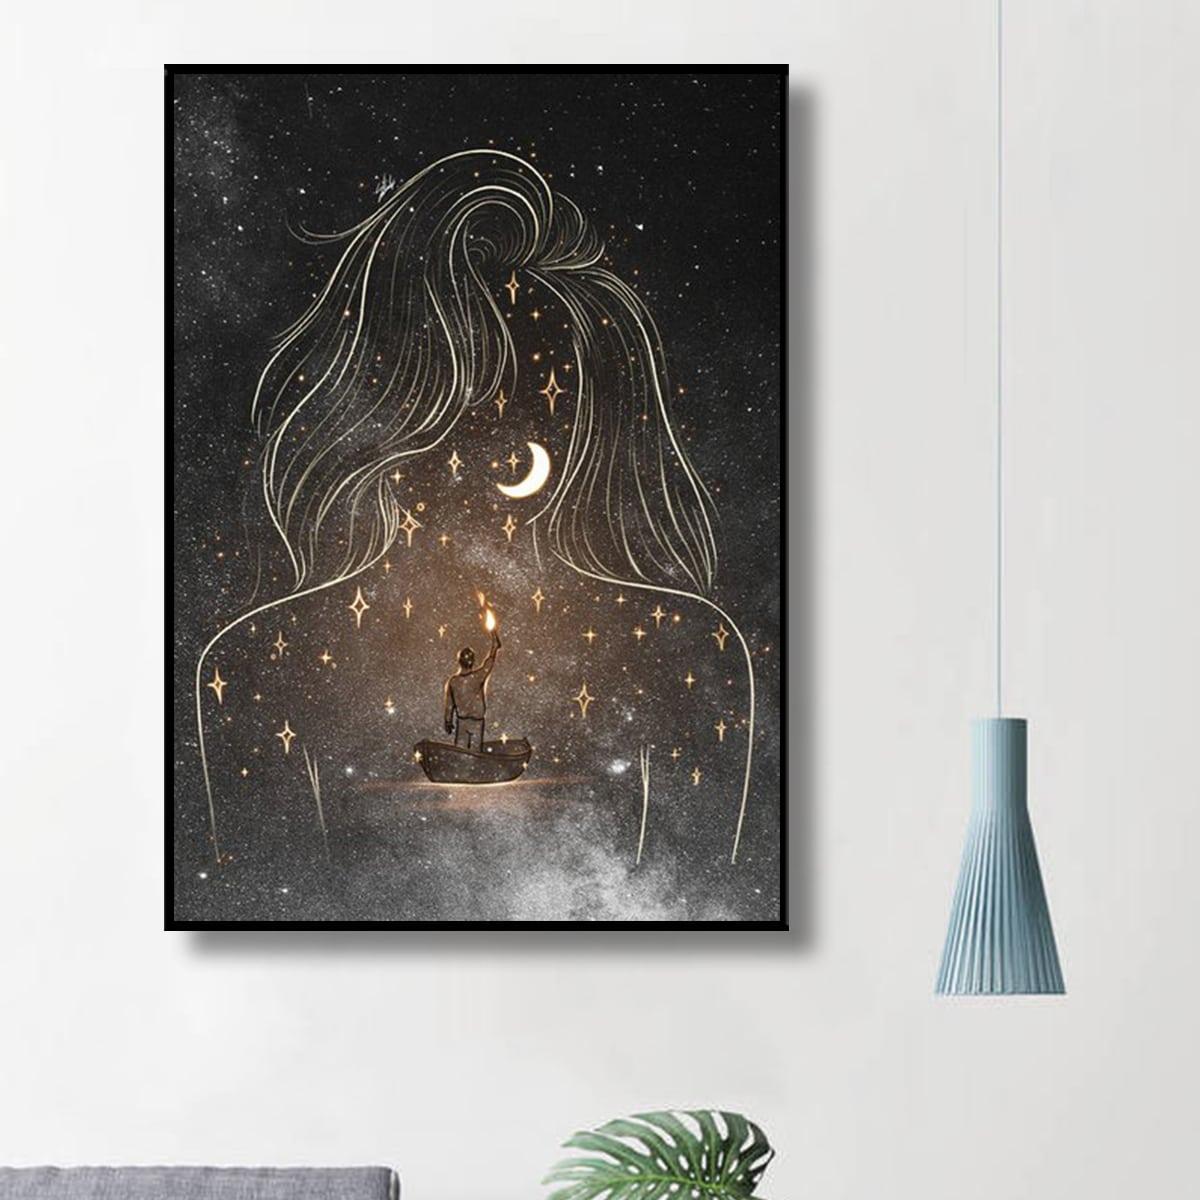 DIY Diamand Malerei mit Stern Muster ohne Rahmen